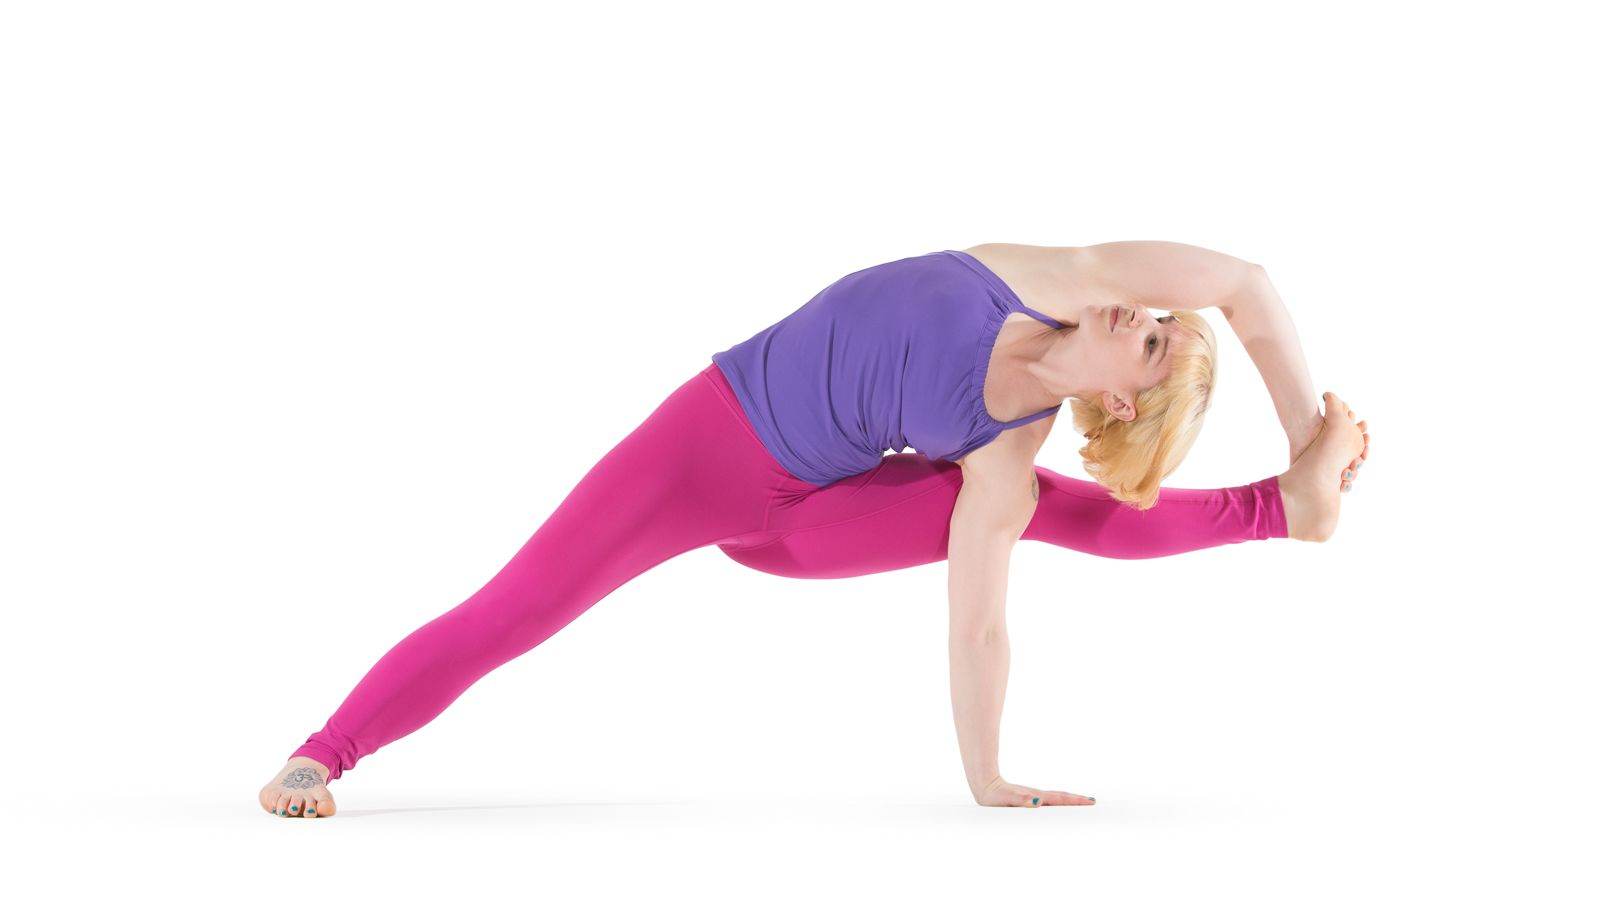 Sage Visvamitra Arm Balance Inversions Yoga Poses Yoga Poses Poses